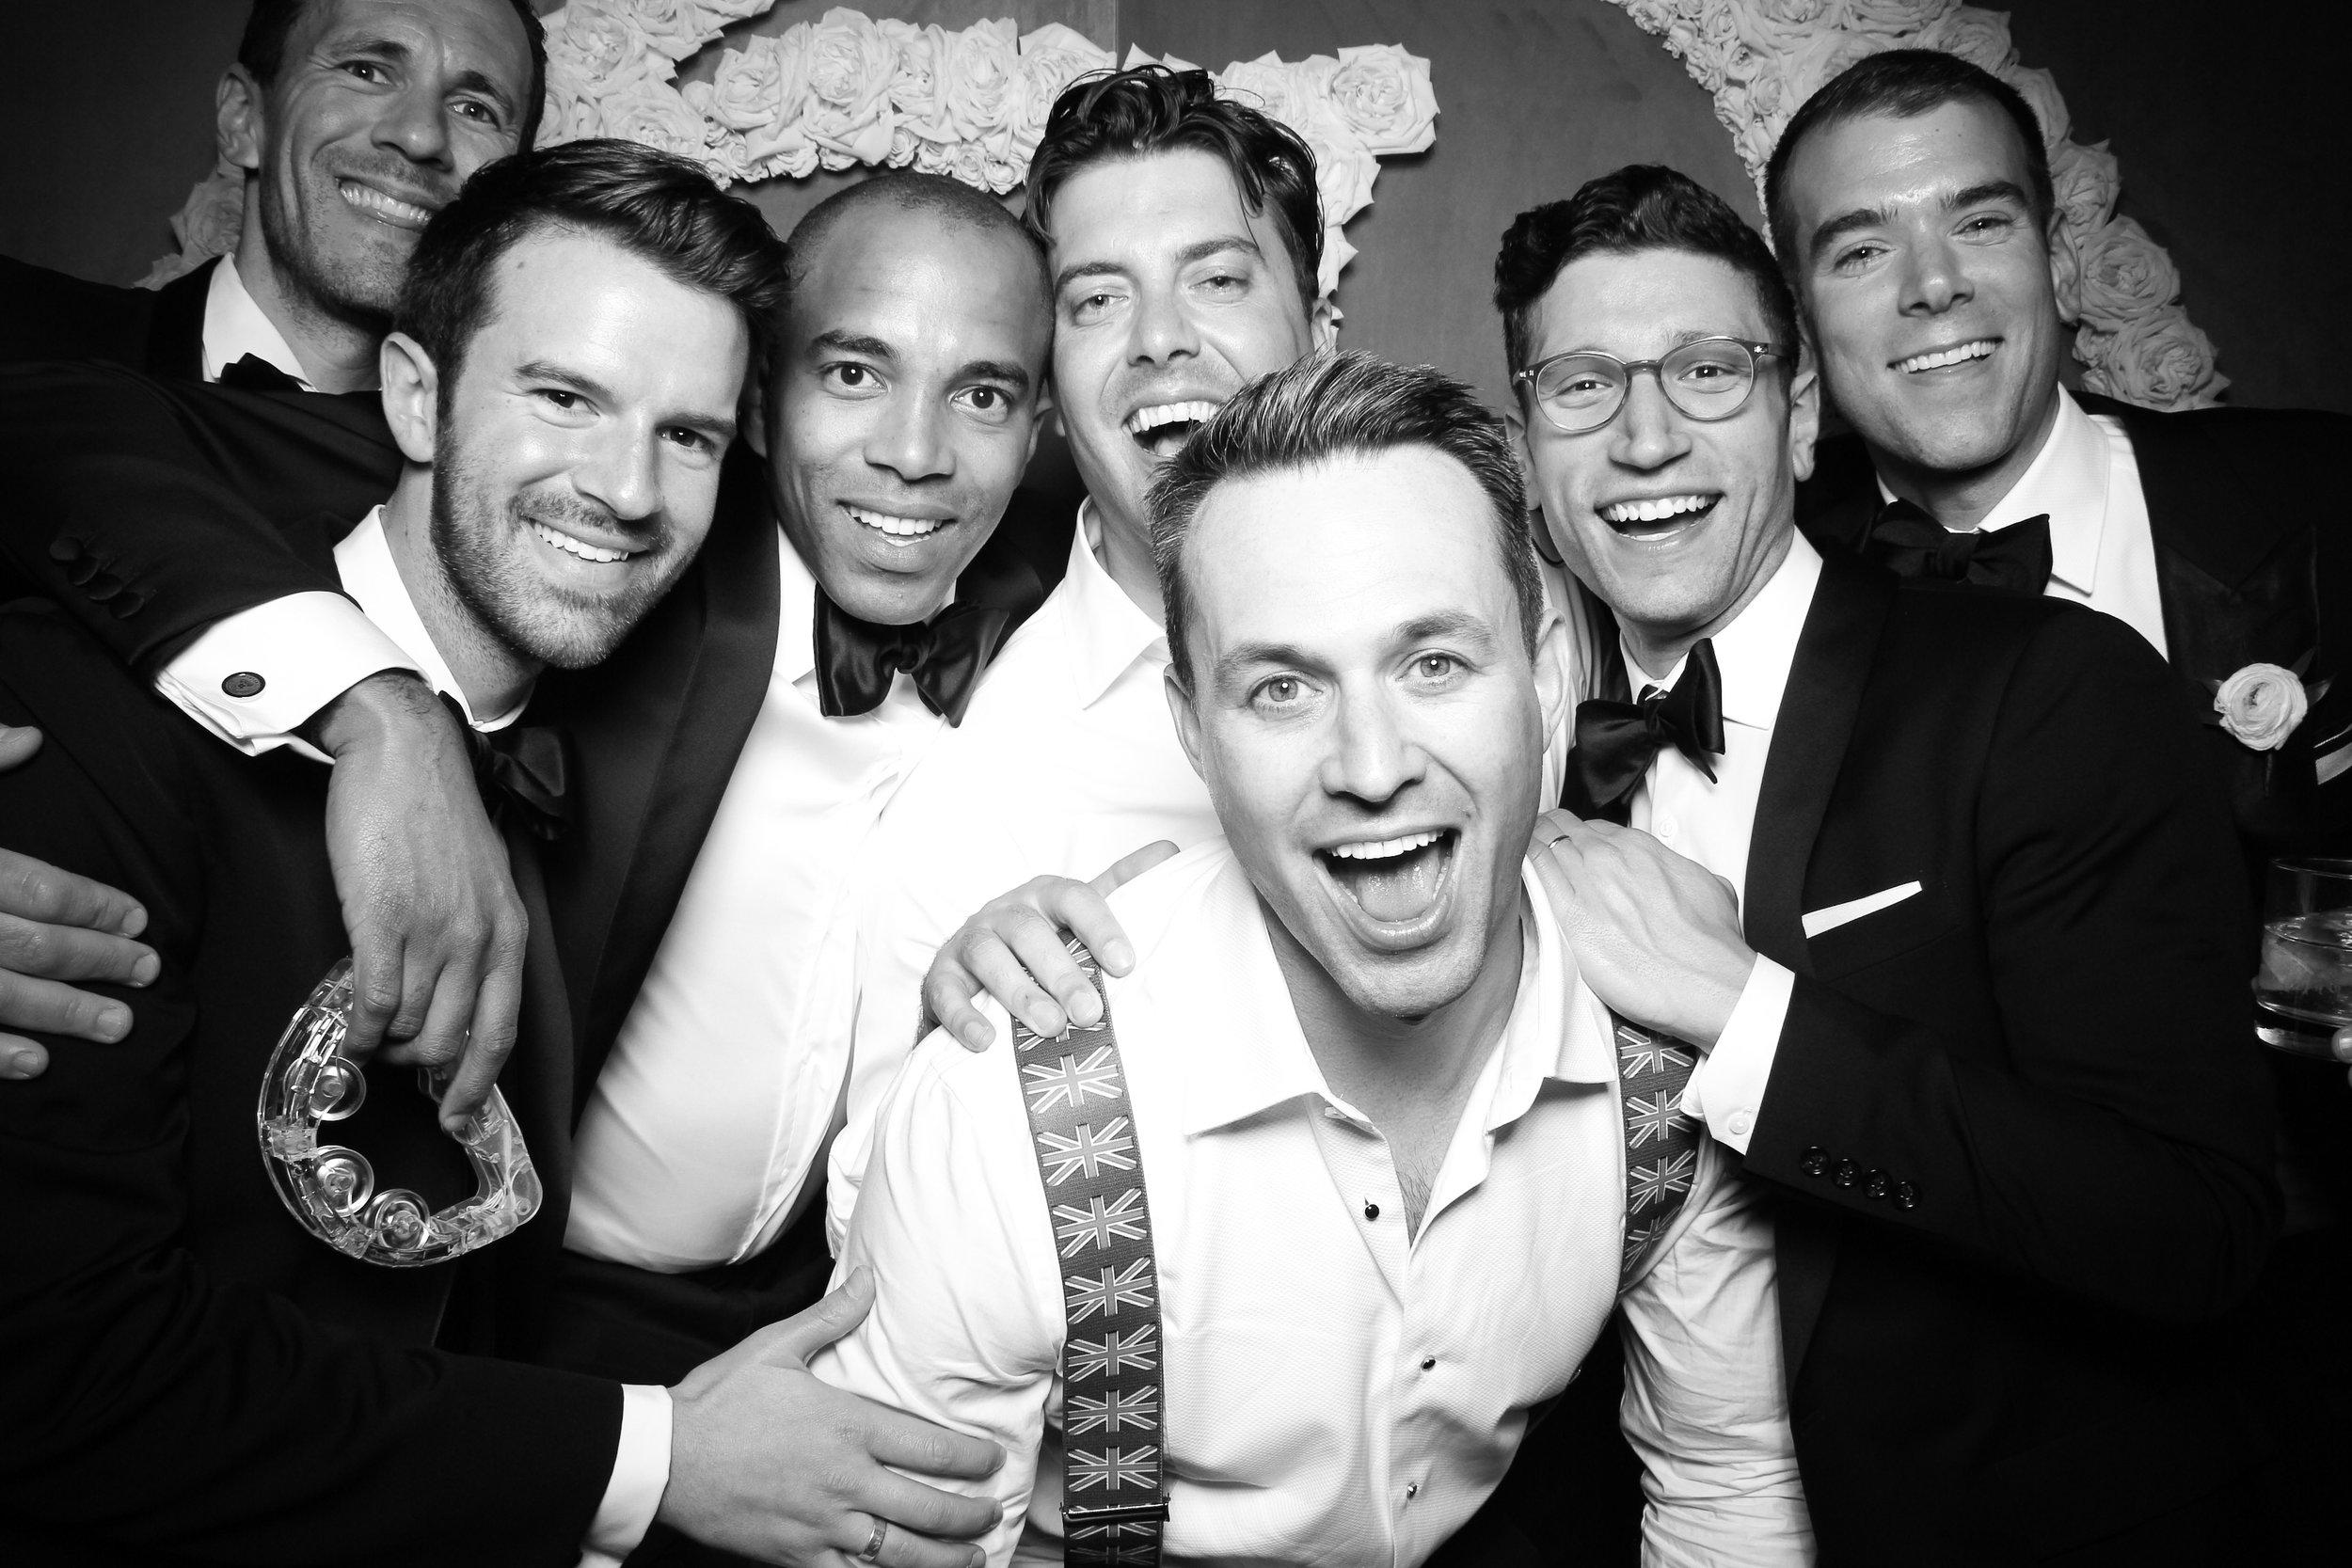 Photo_Booth_Rental_At_Standard_Club_Wedding_Chicago_02.jpg